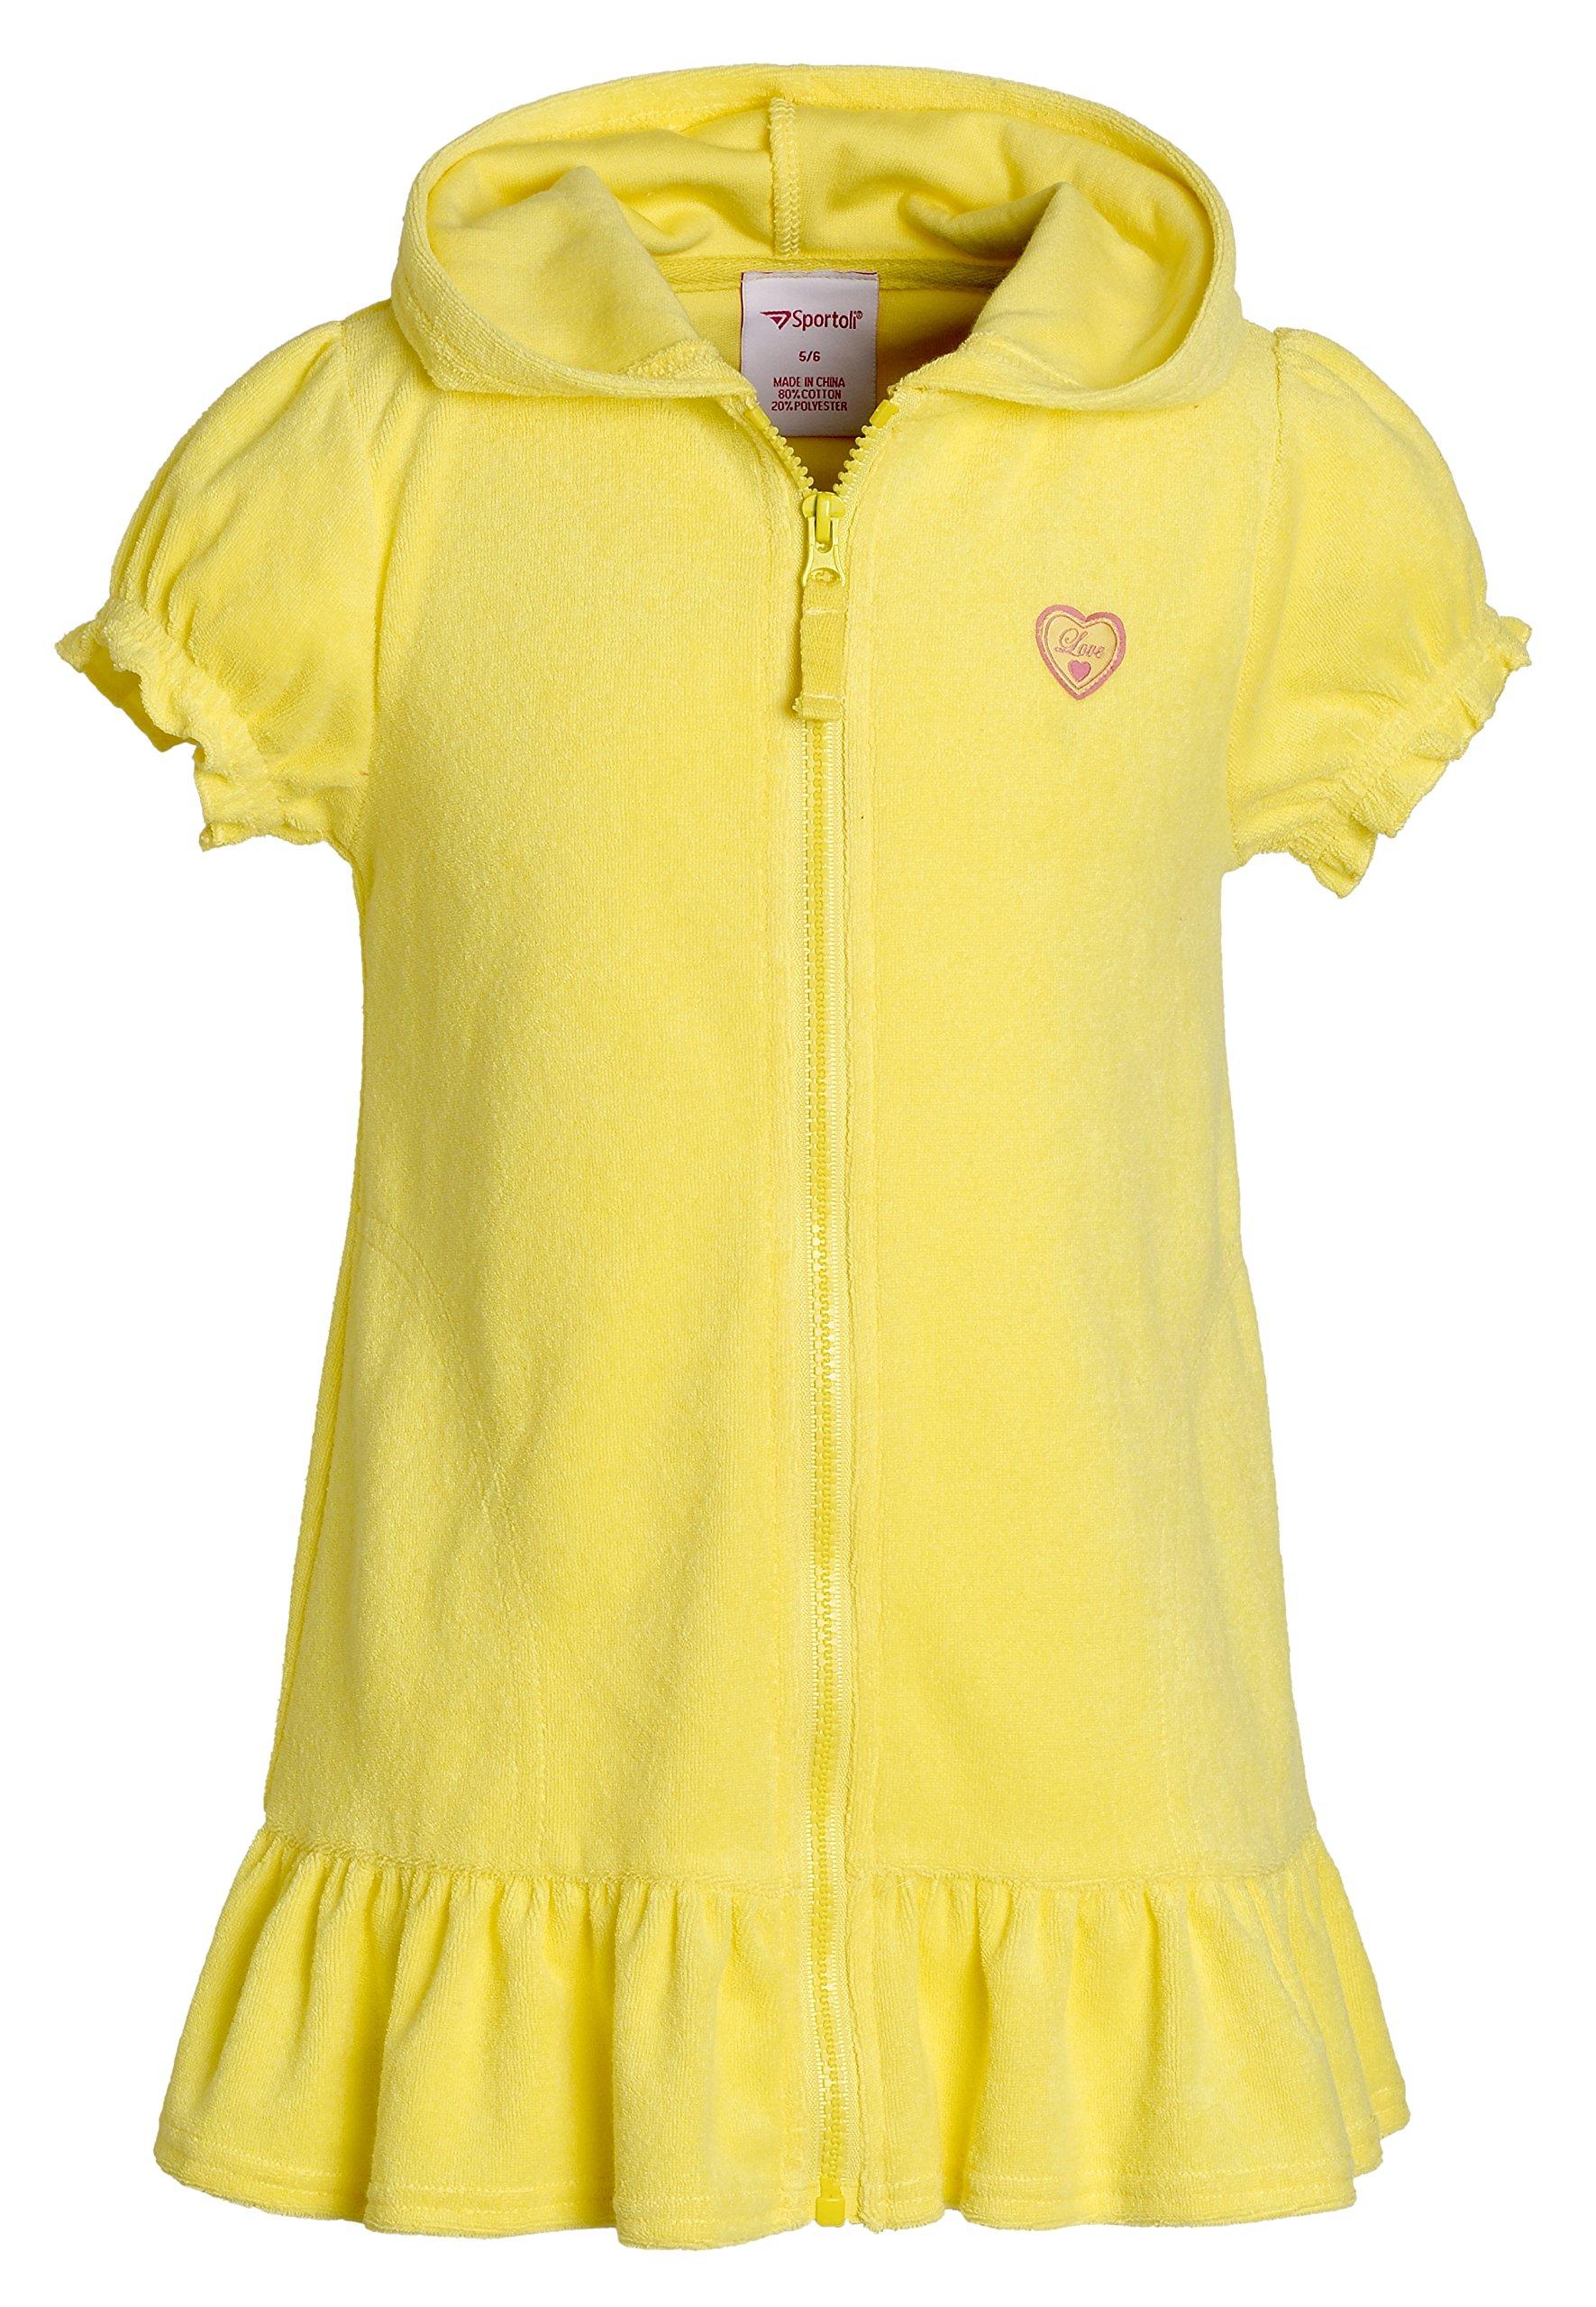 Beach Coverups for Girls Swimsuit Cover up Cotton Terry Hood Swim Robe Swimwear - Lemon (Size 7/8)